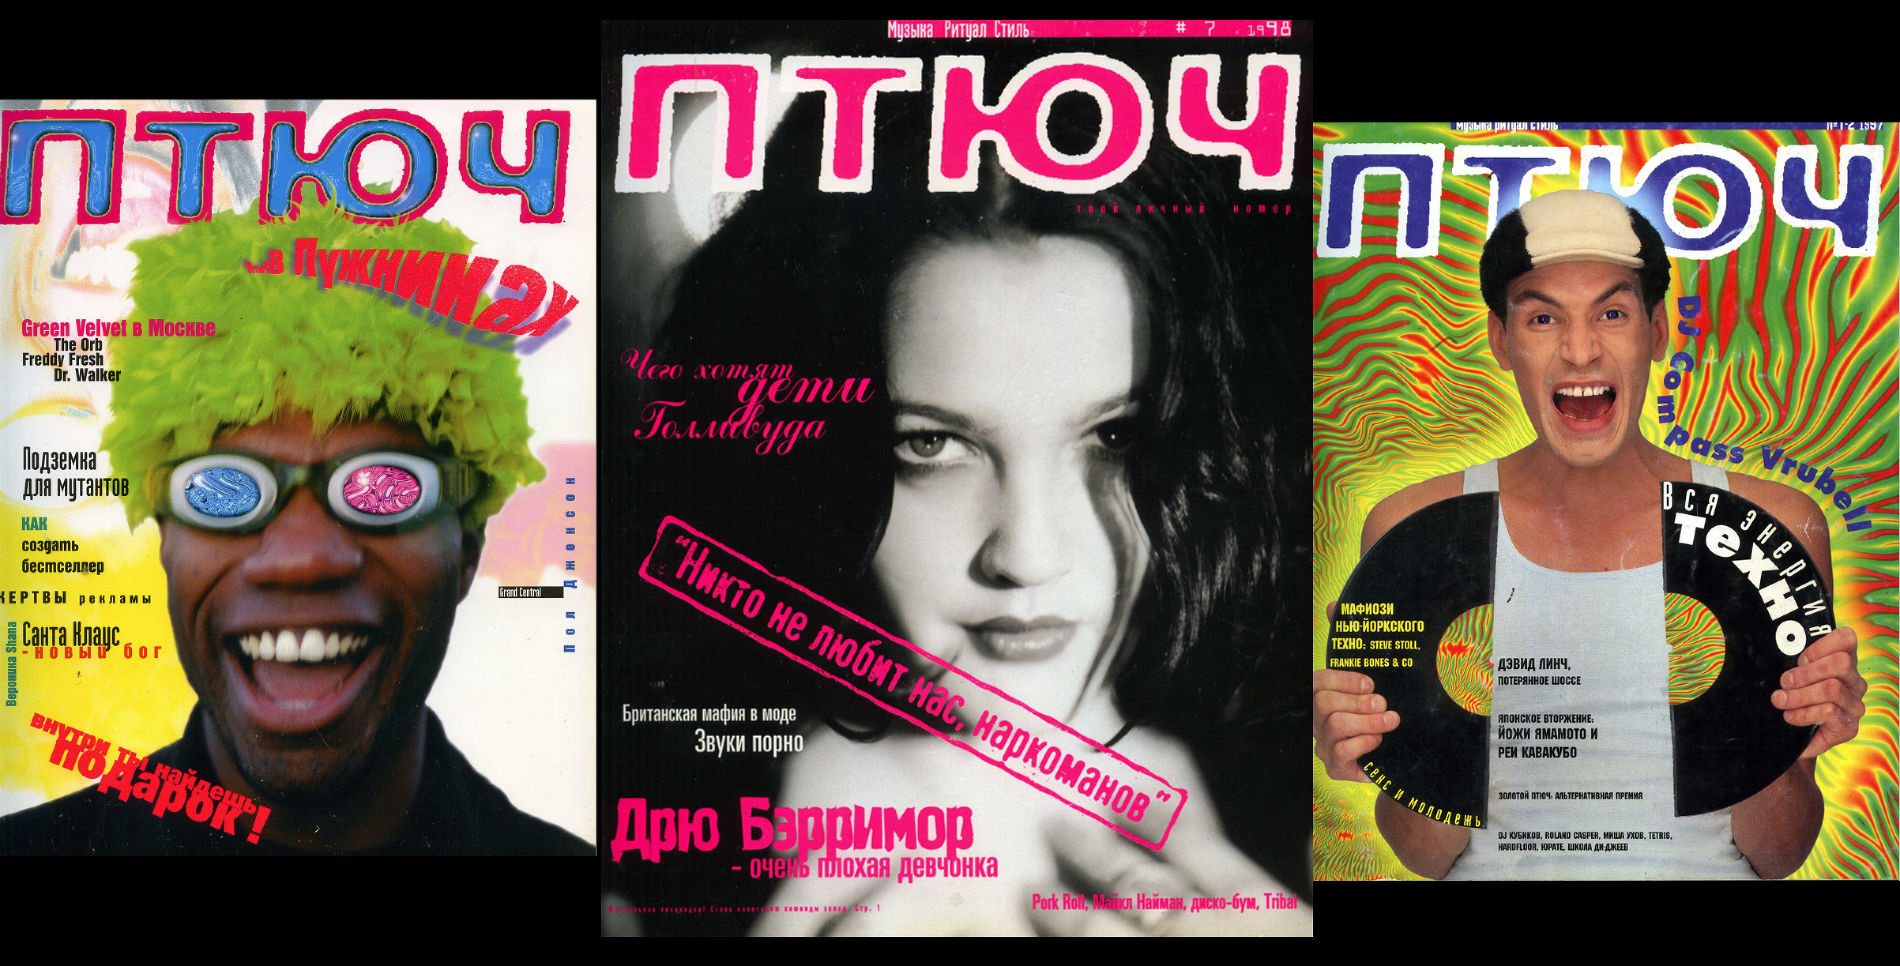 Обложки журнала «Птюч» ©Фото Юга.ру